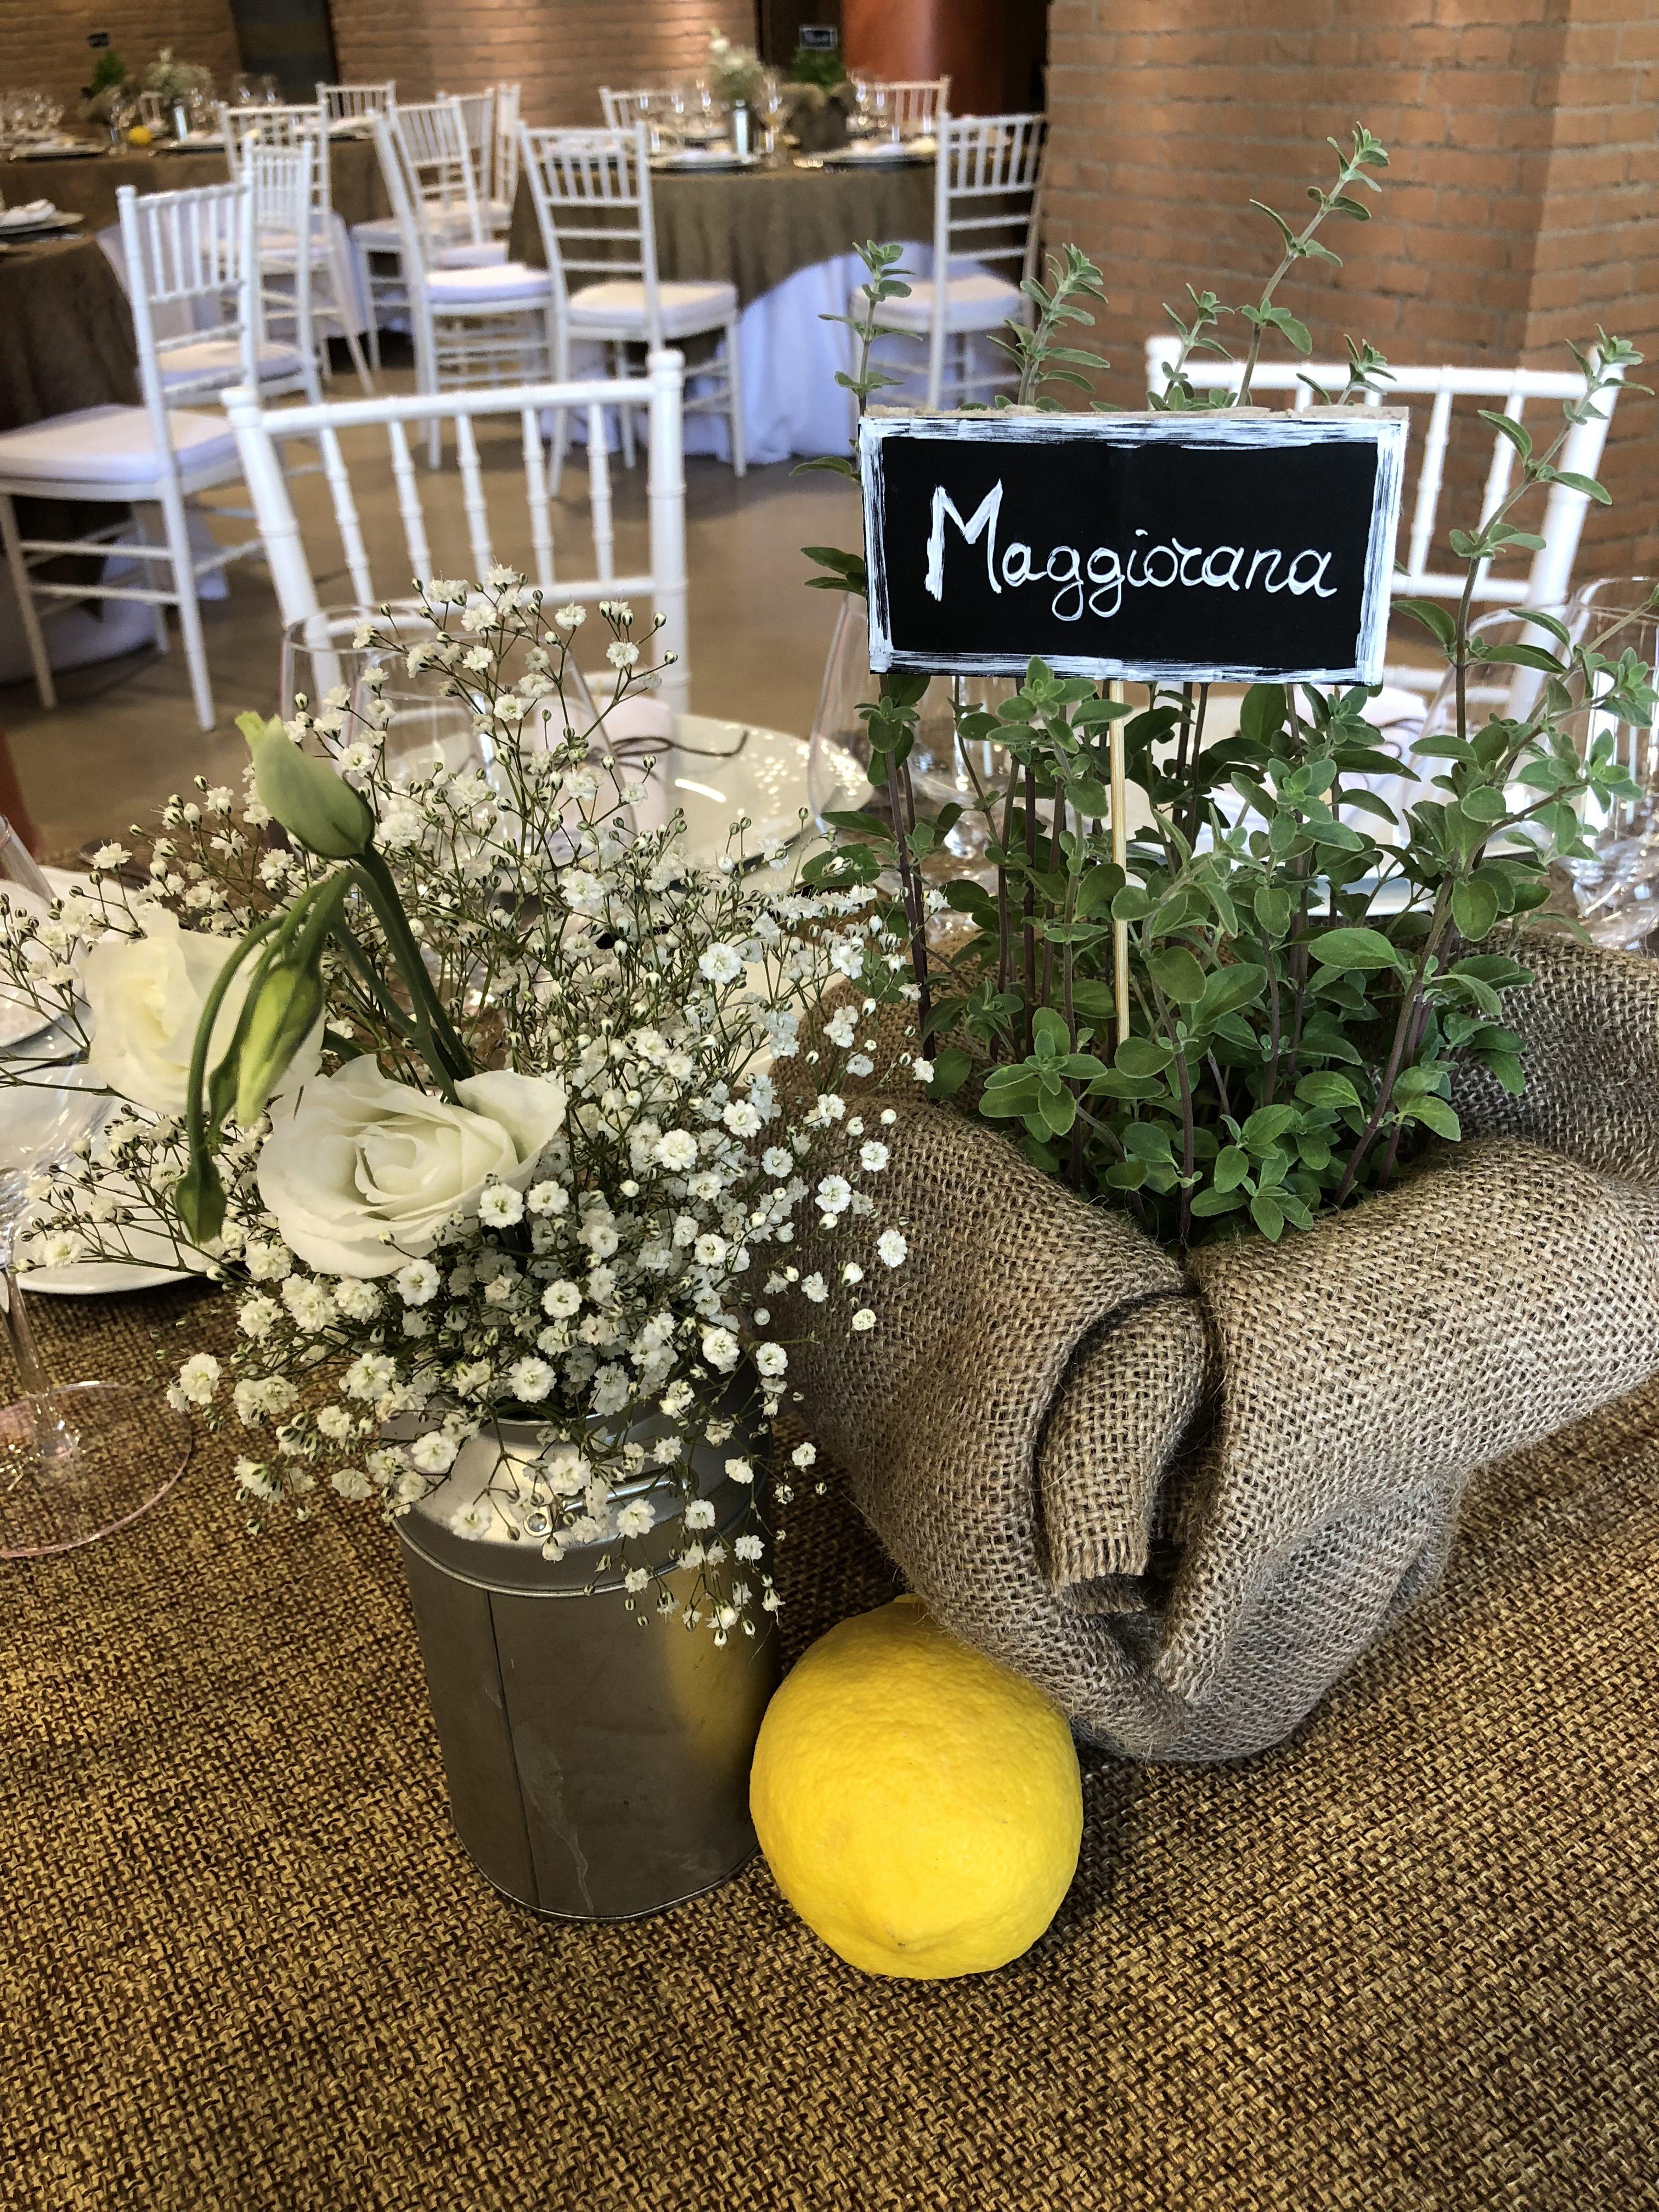 Allestimento Matrimonio Stile Country Chic : Matrimonio country roma maan catering banqueting frascati